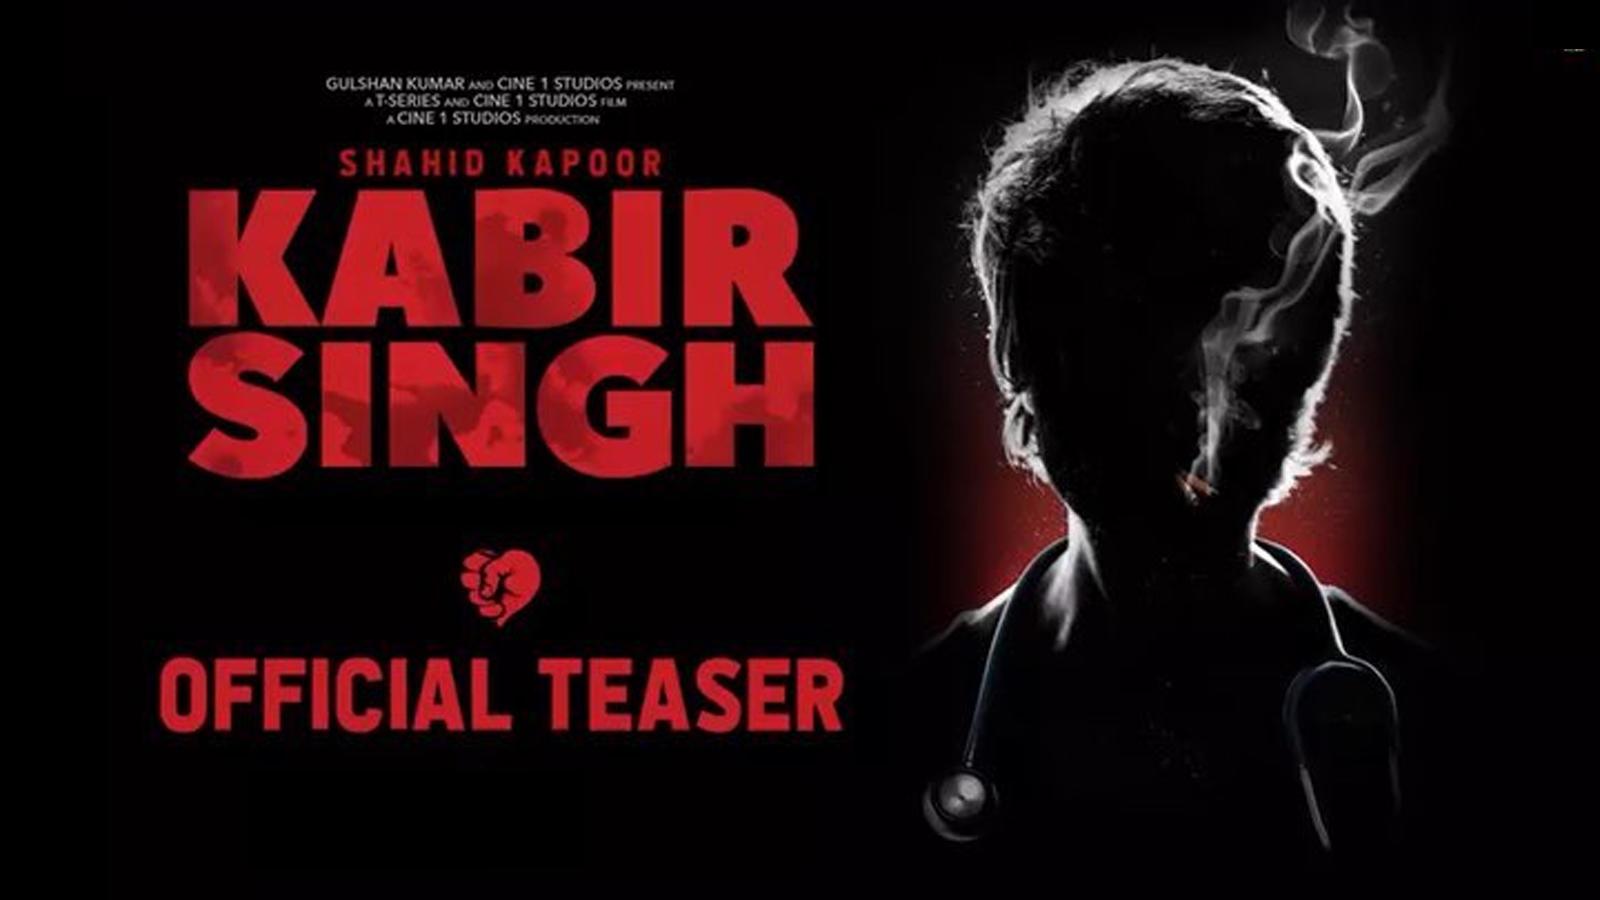 Celebrities Wow Reaction On Shahid Kapoor And Kiara Advani Starrer